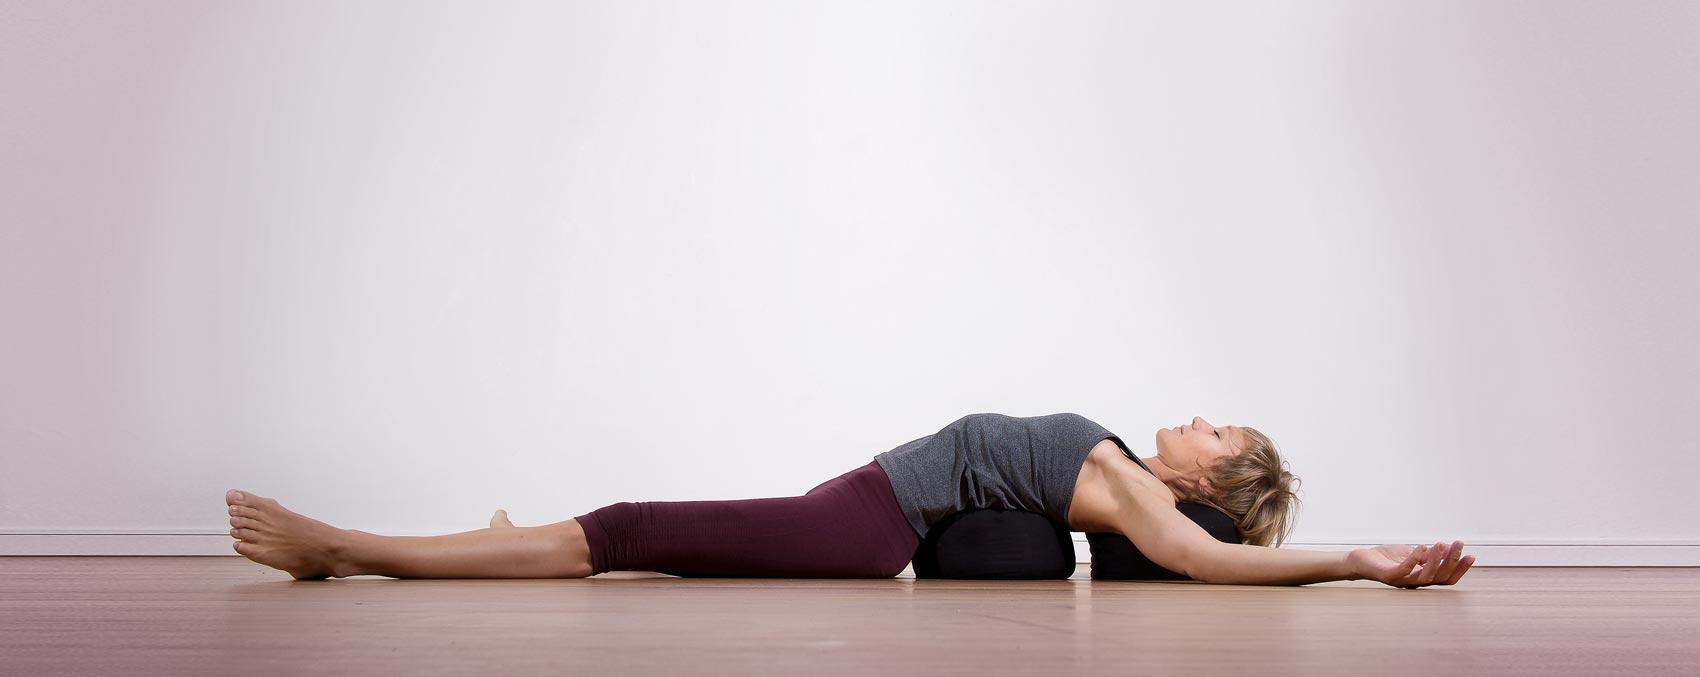 Yin Yoga Teacher Training 200 hour Yoga Alliance José de groot